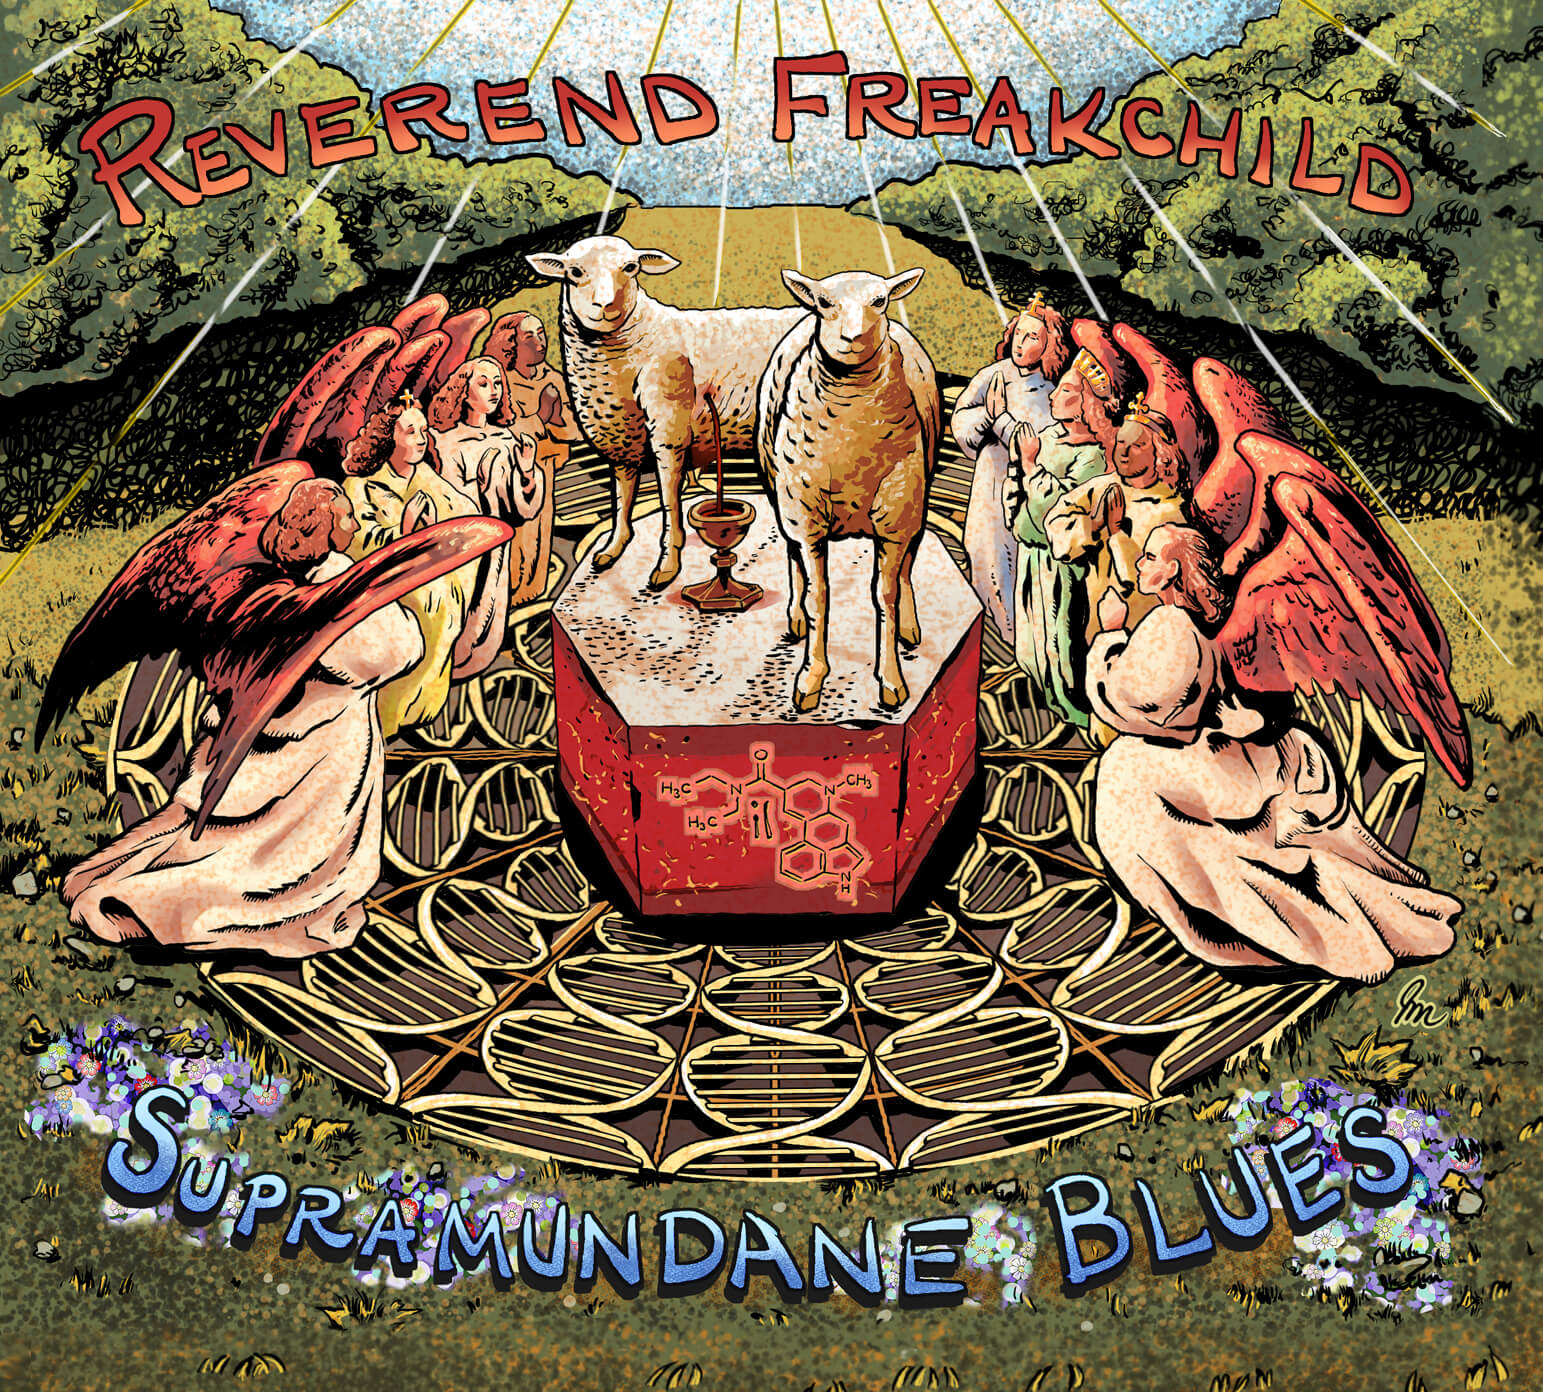 Reverend Freakchild - Supramundane Blues